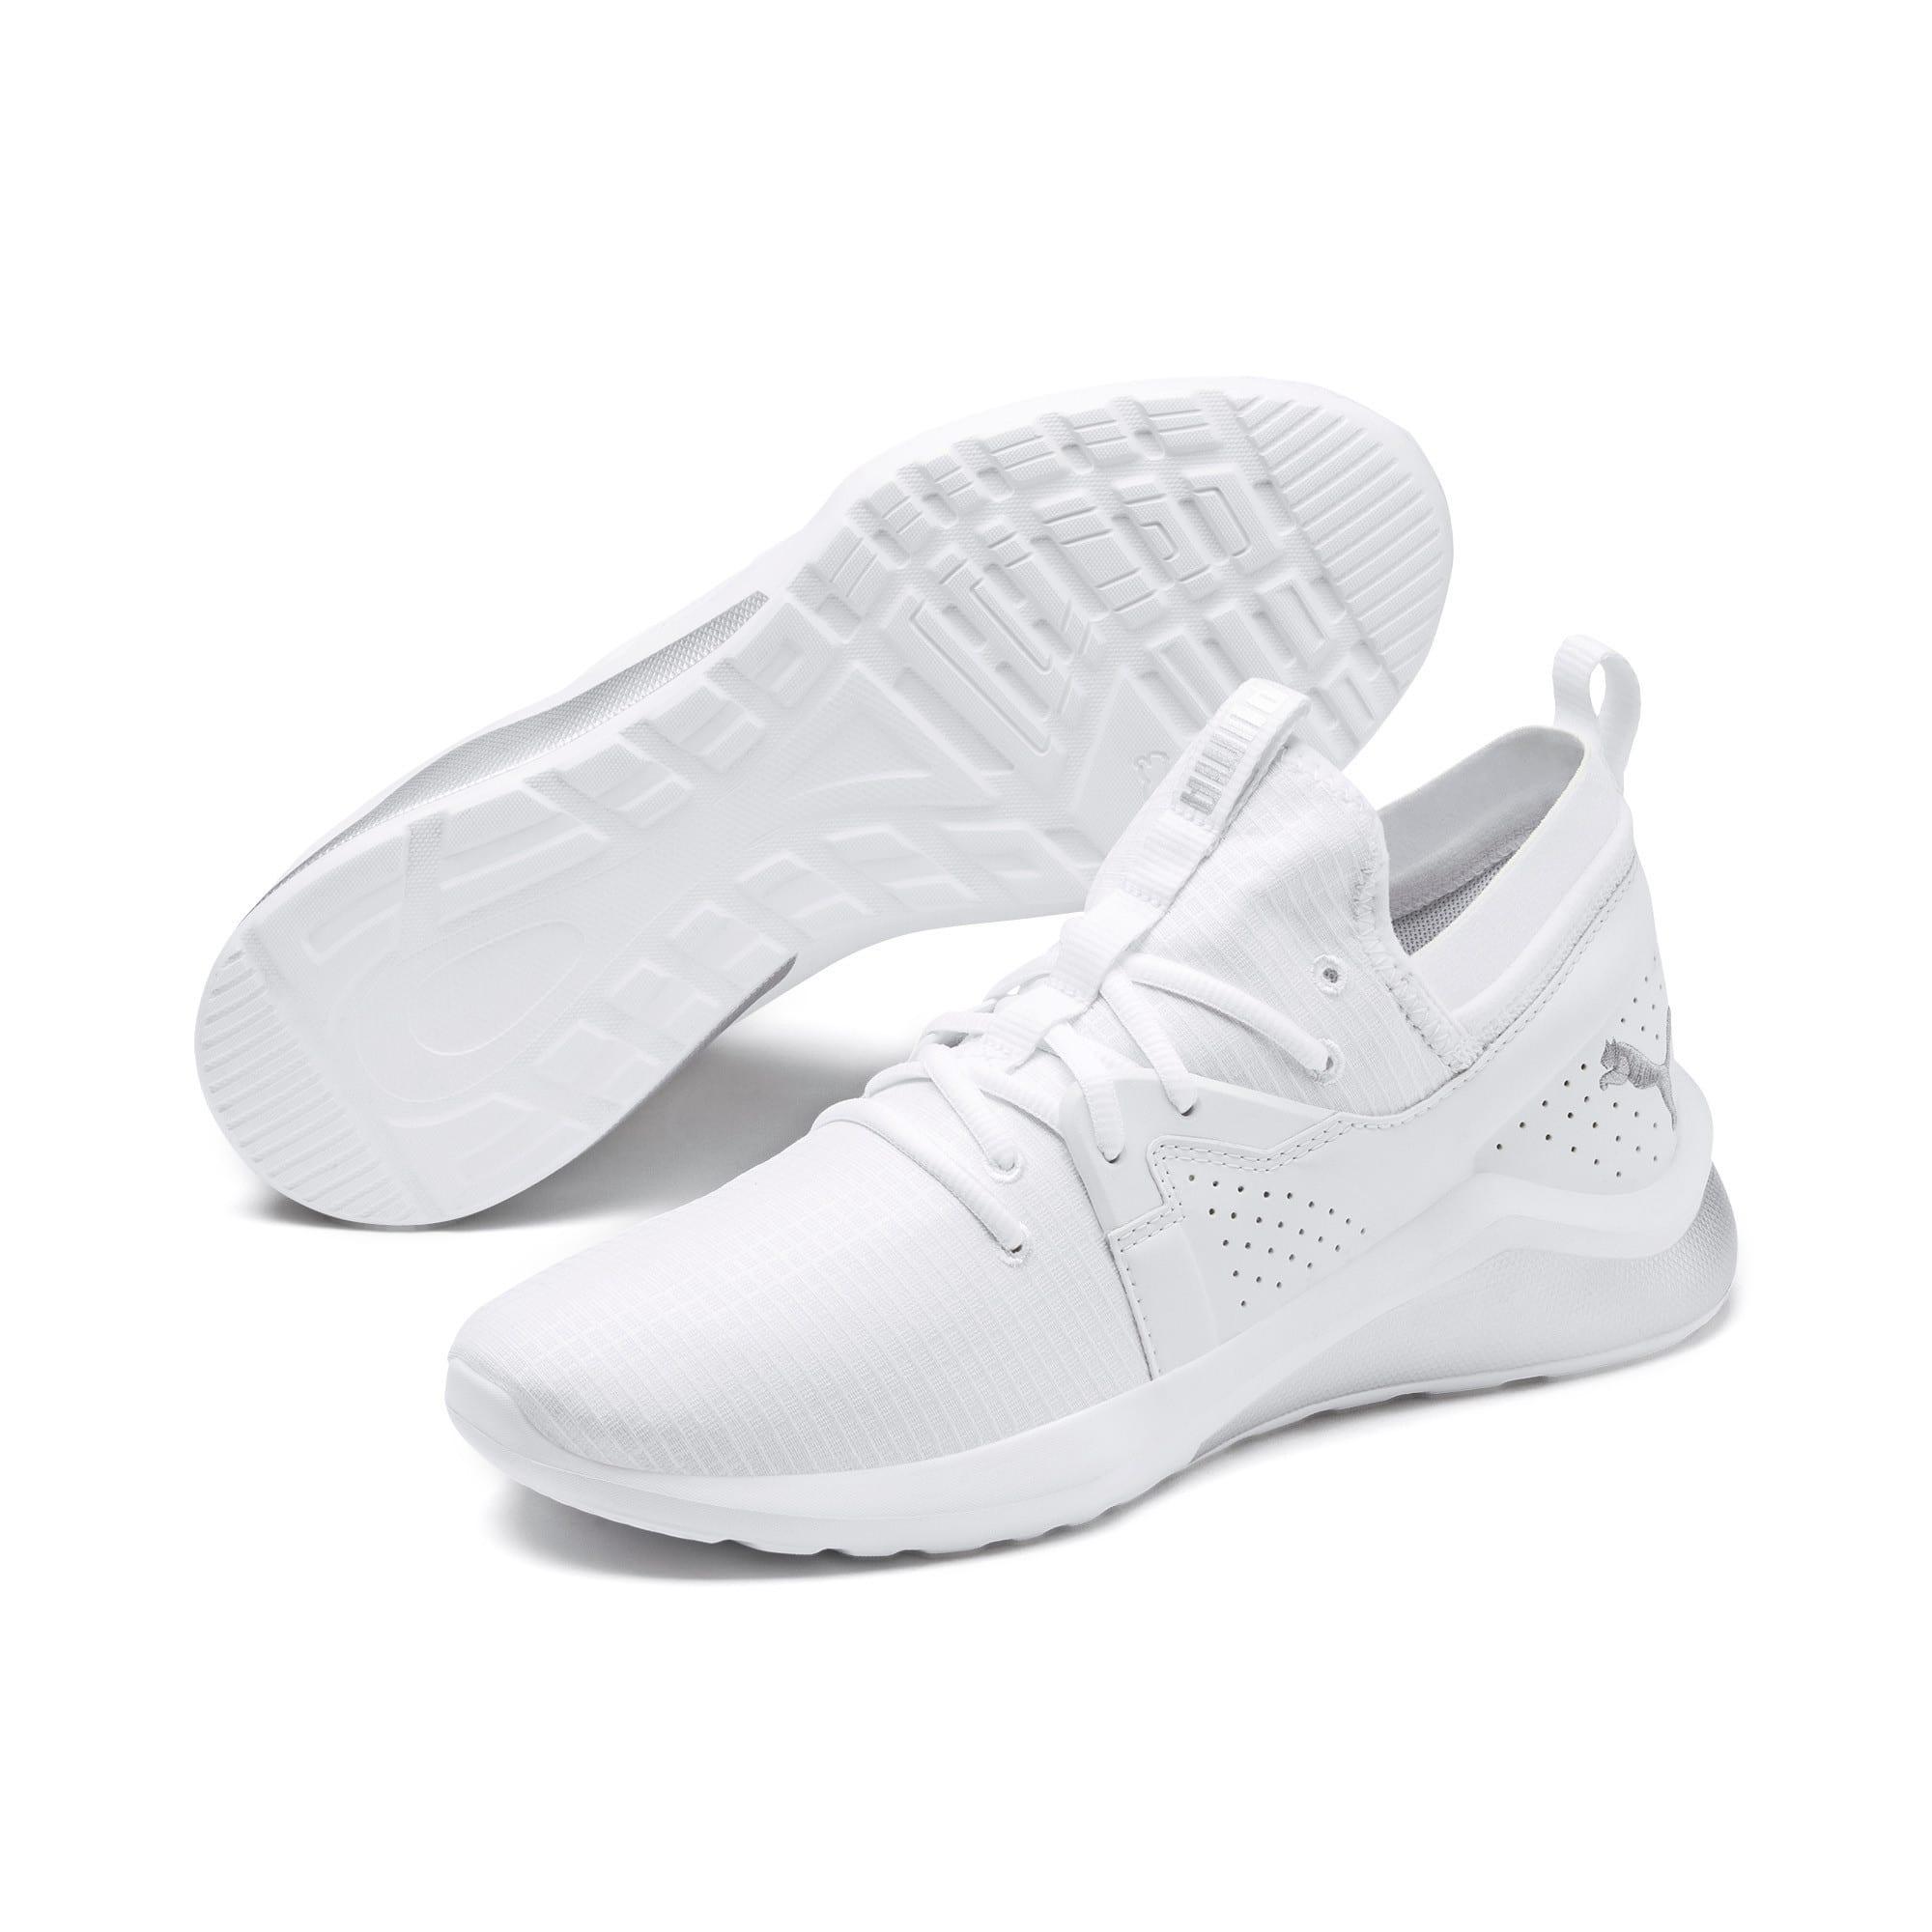 Thumbnail 8 of Emergence Lights Men's Running Shoes, Puma White-Puma Silver, medium-IND